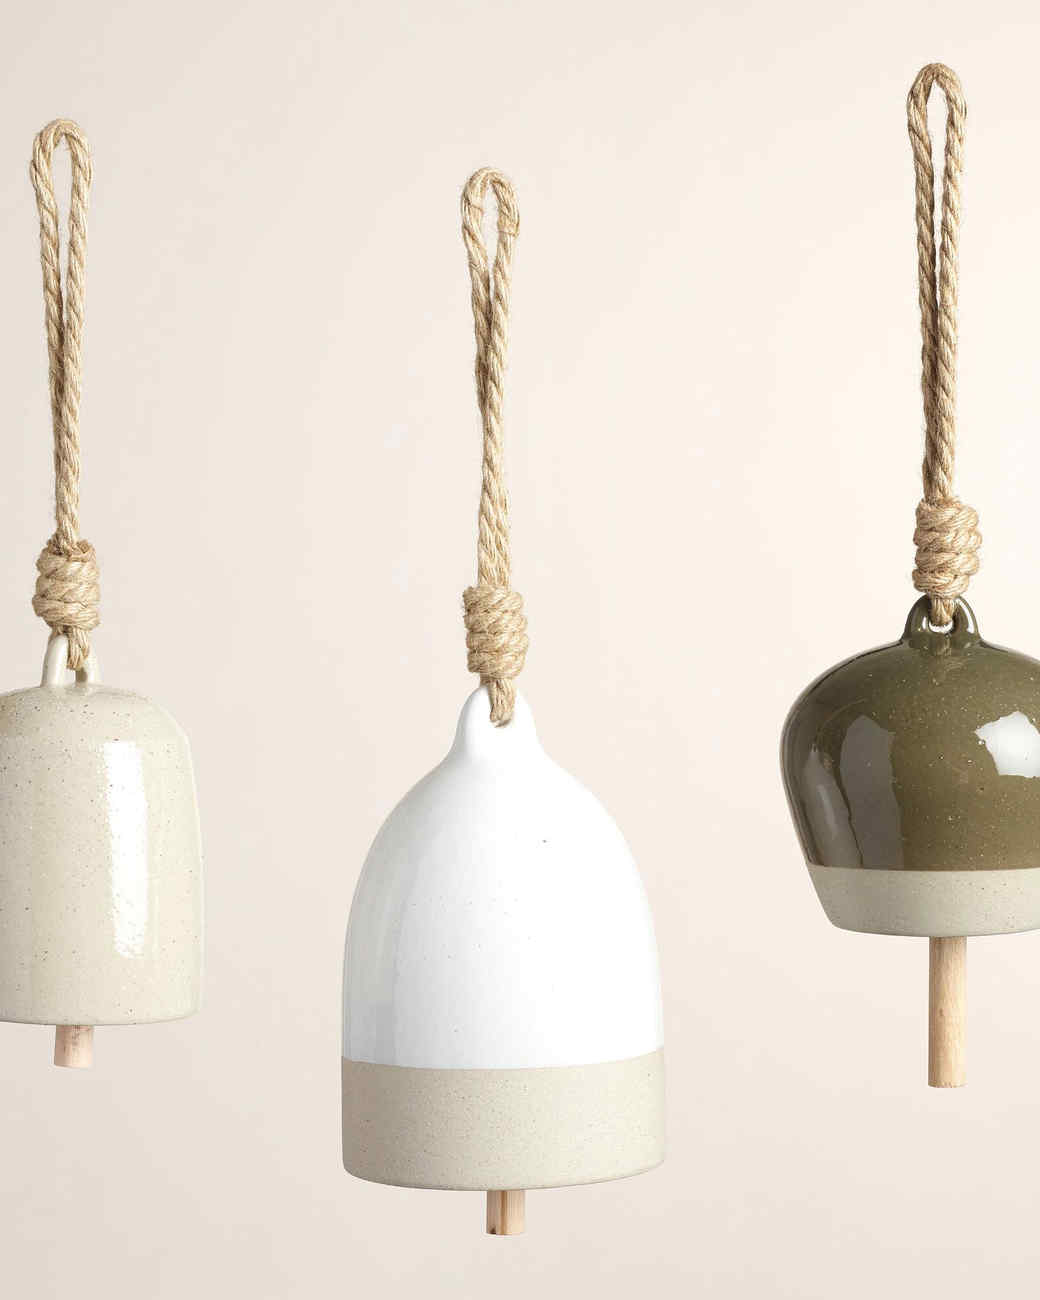 world-market-hanging-bell.jpg